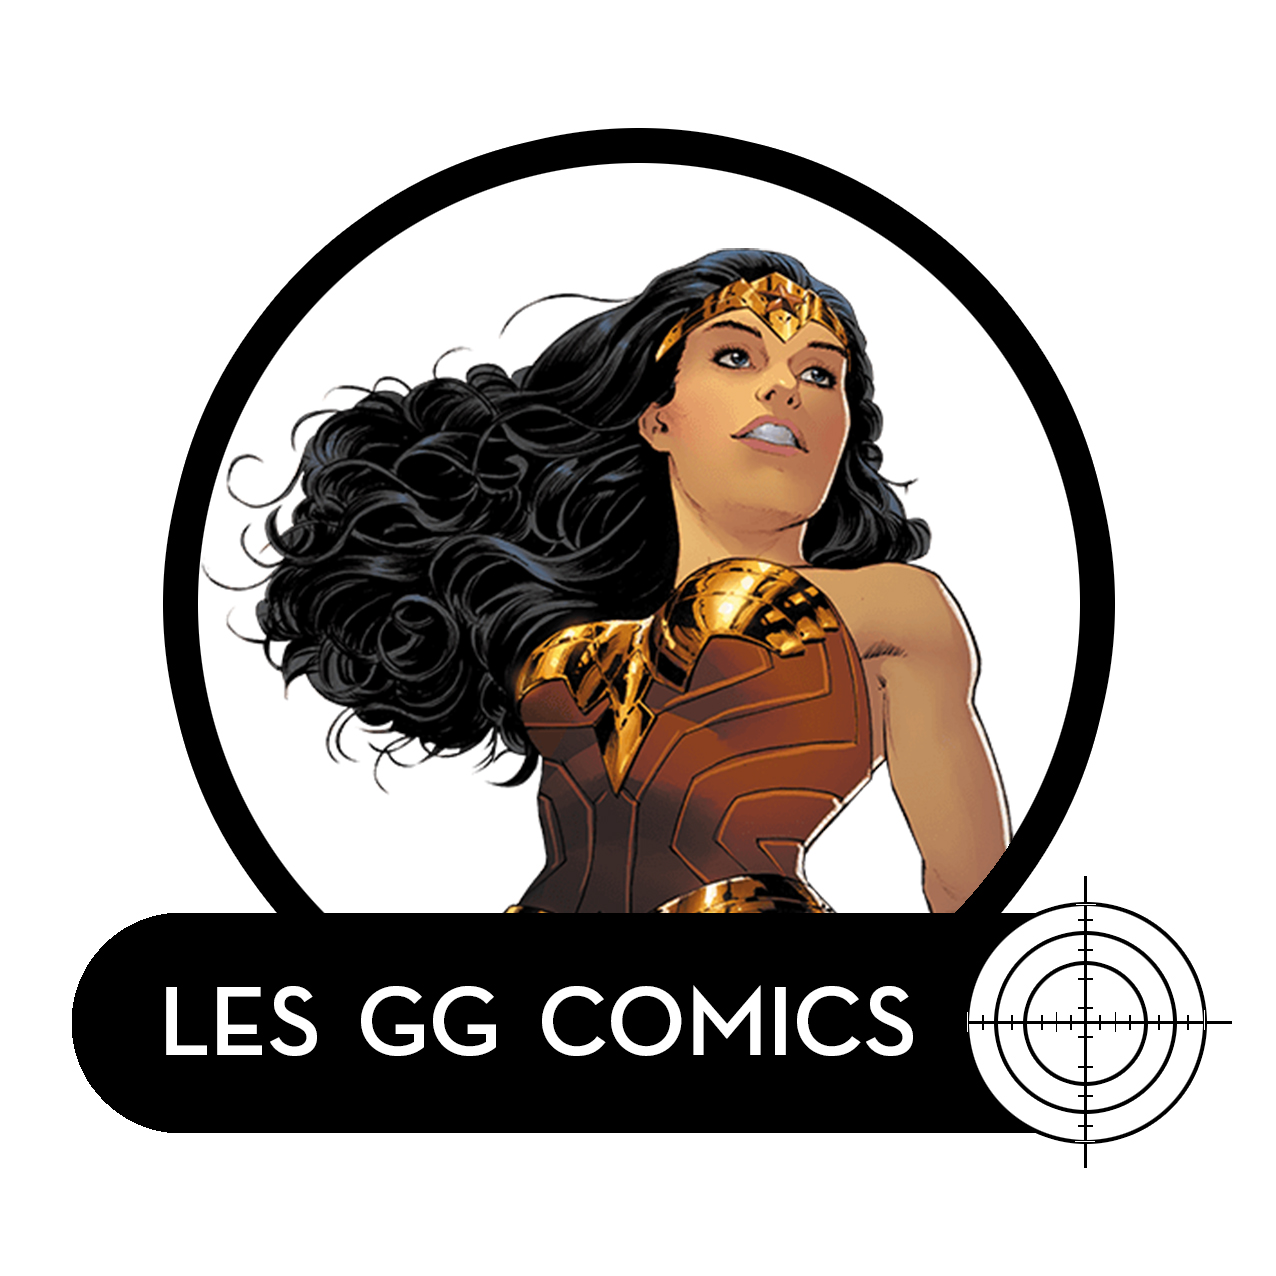 Les GG comics - HS7 : ITW de Nicola Scott [Paris Manga 2019]